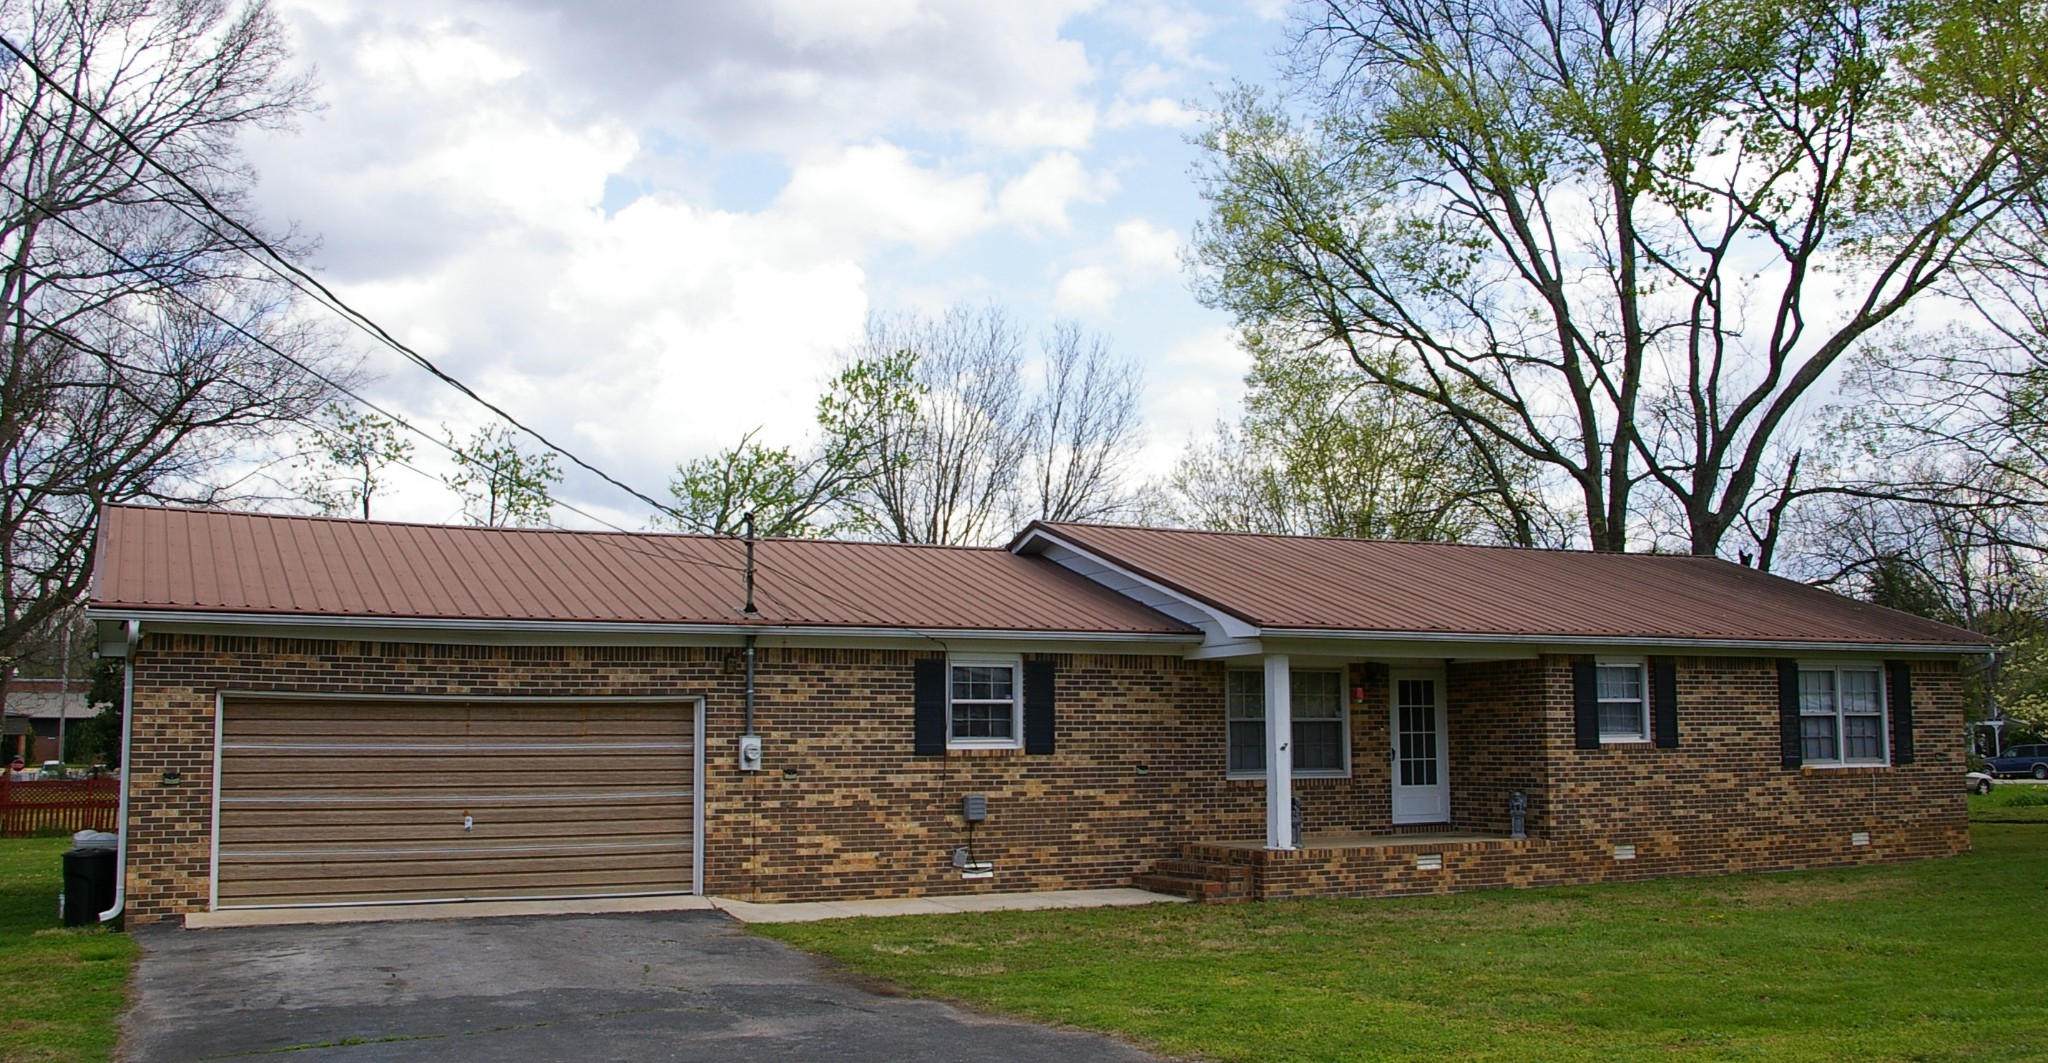 102 Hill St N Property Photo - Cowan, TN real estate listing